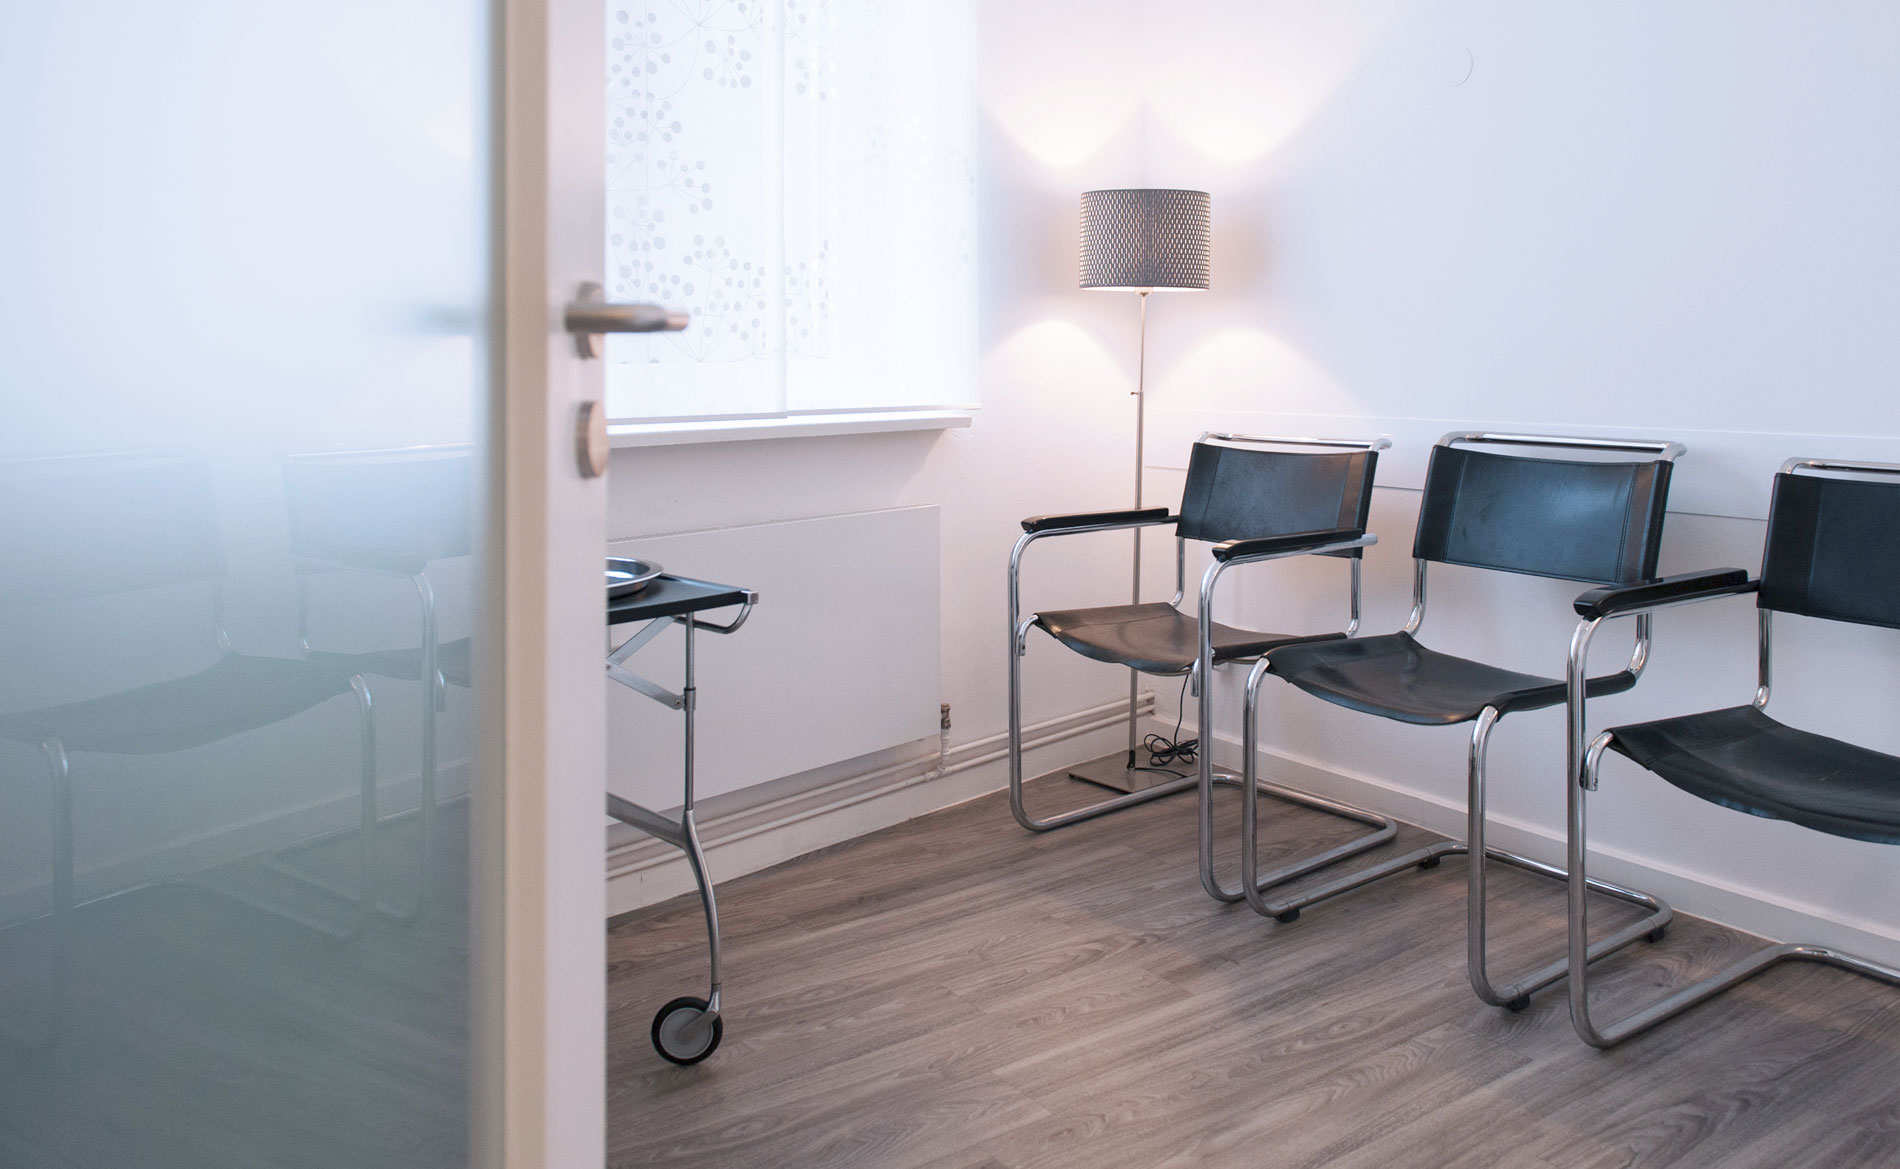 Zahnarzt Dr. Barbara Kammler-Wittig - Praxis Wartezimmer